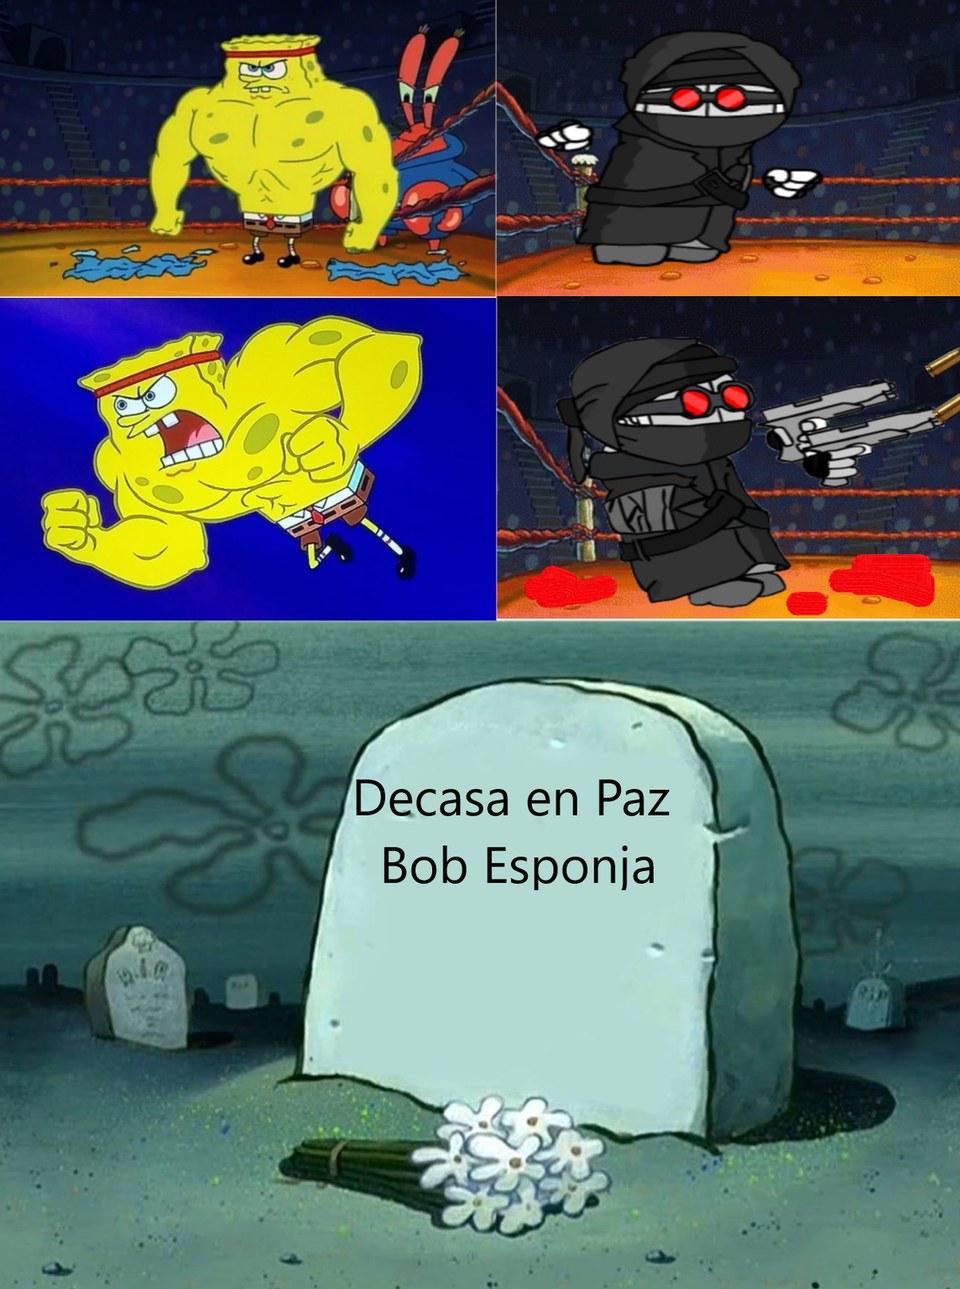 Bob Esponja Musculosos vs Hank - meme